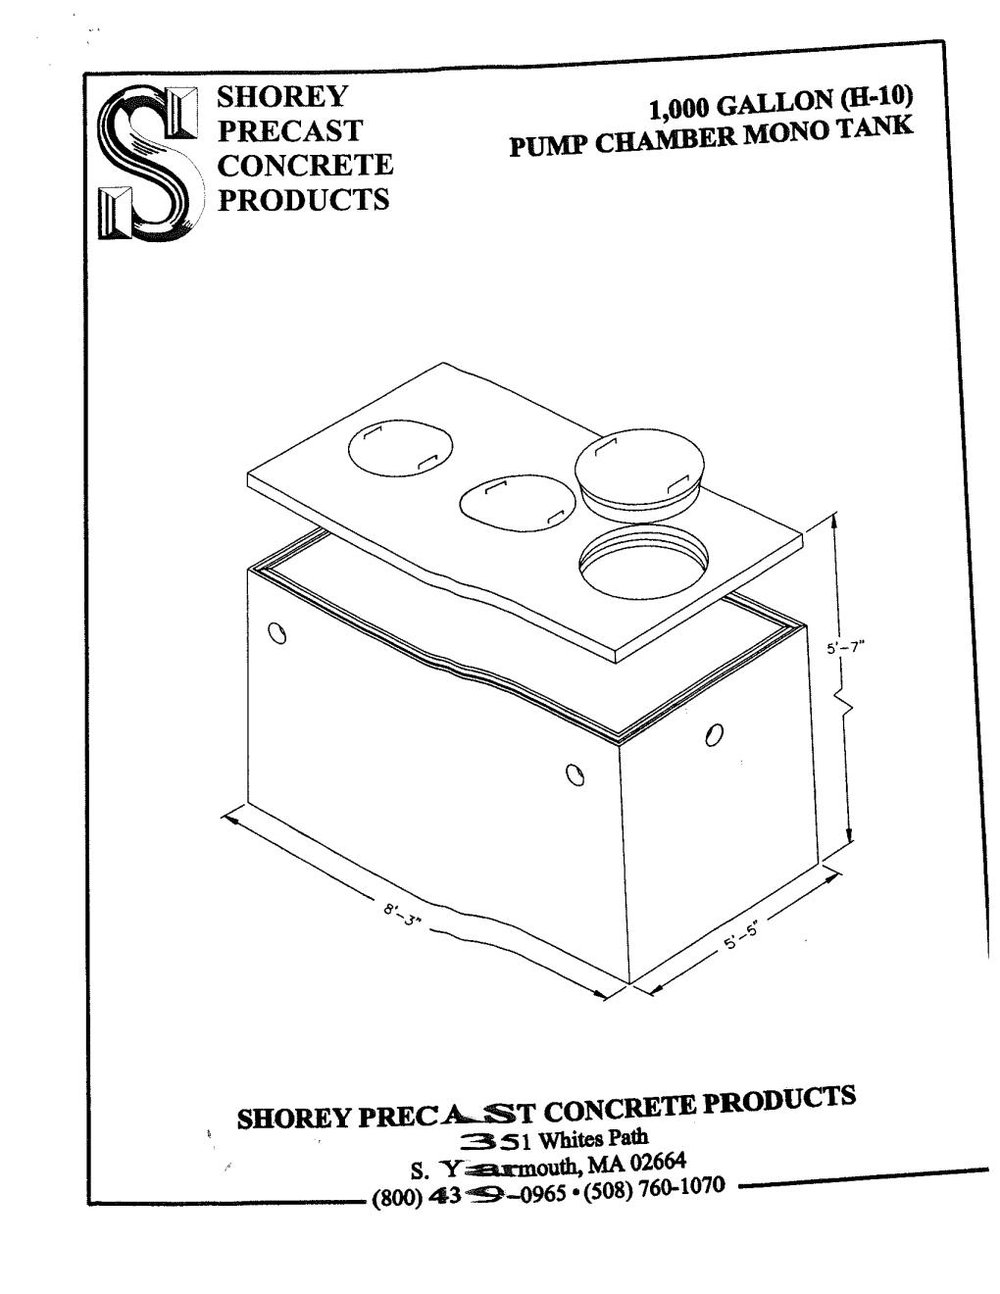 ACMEShorey Tanks Page 005.jpg